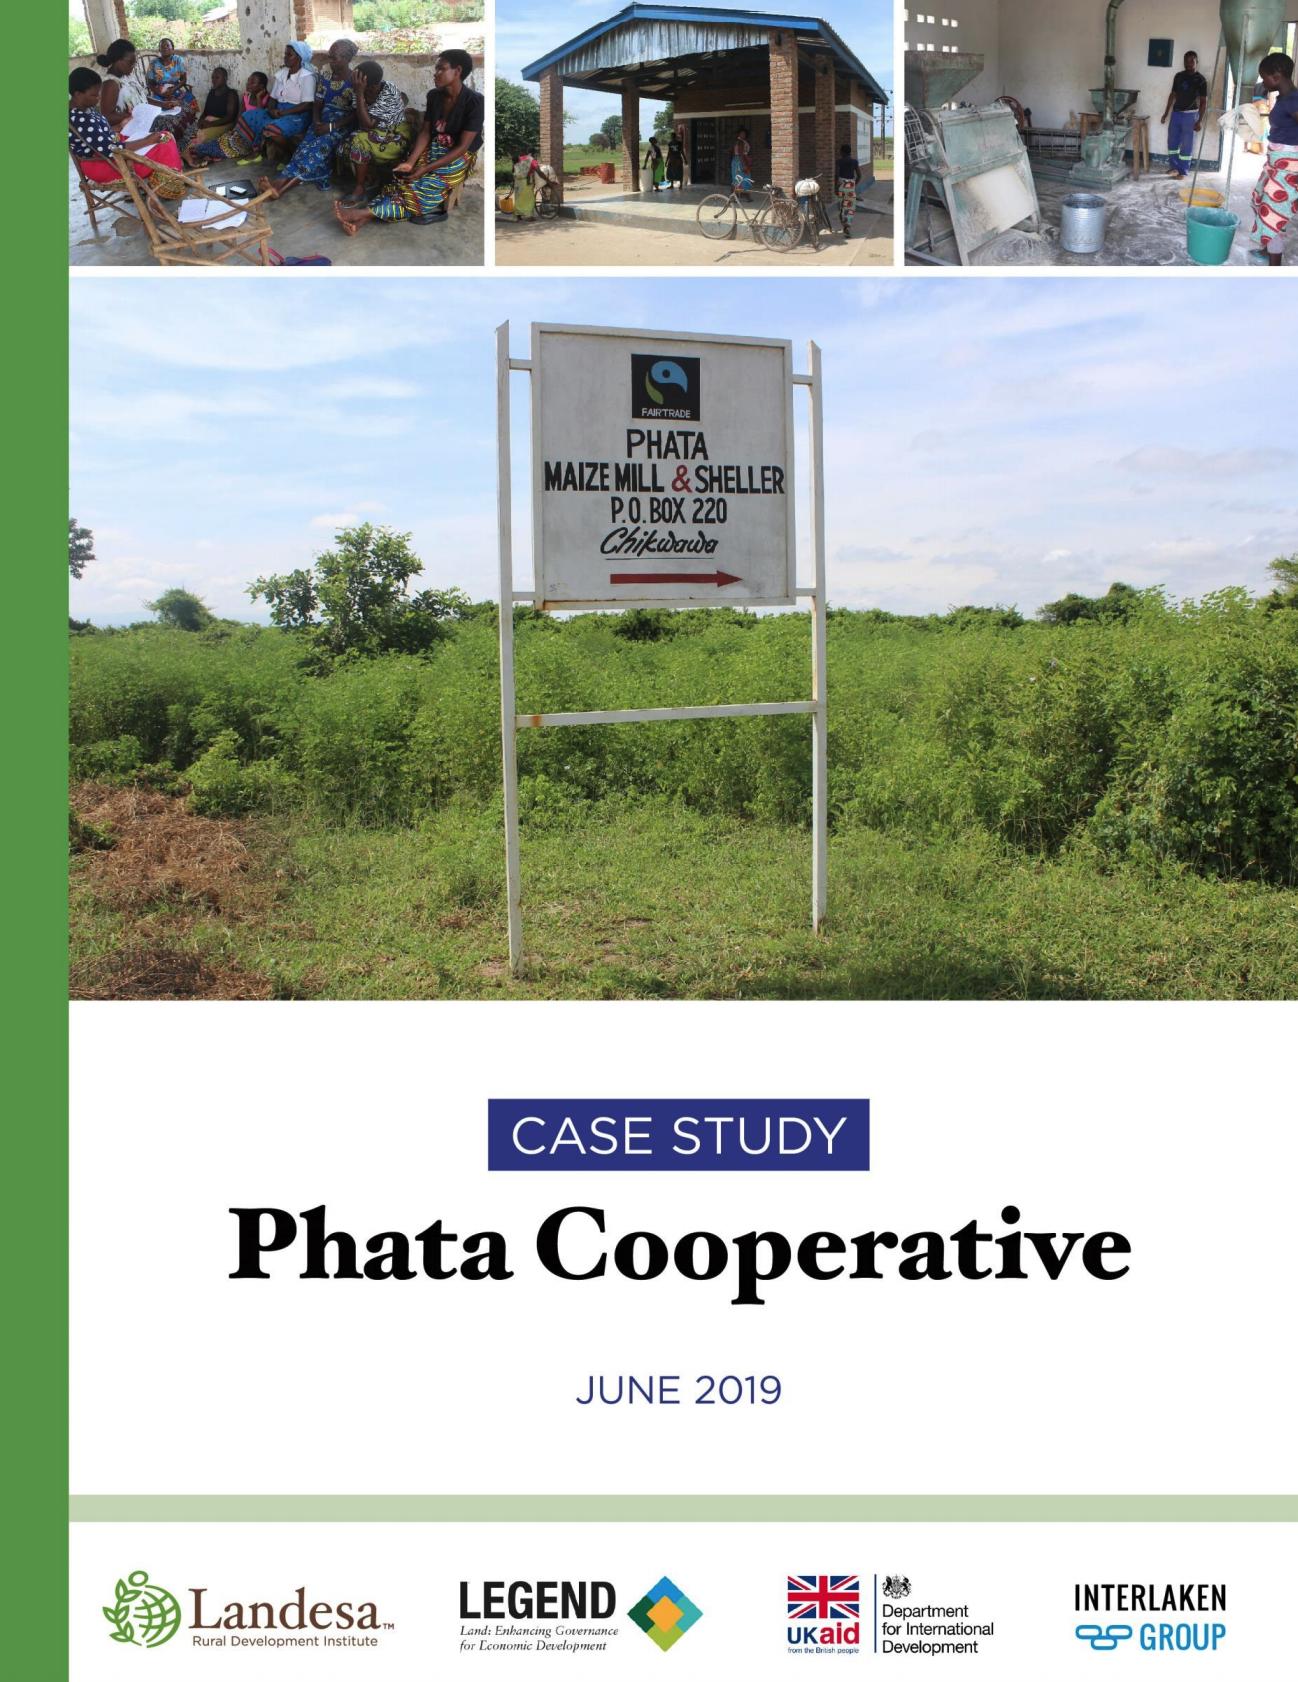 Case Study: Phata Cooperative cover image